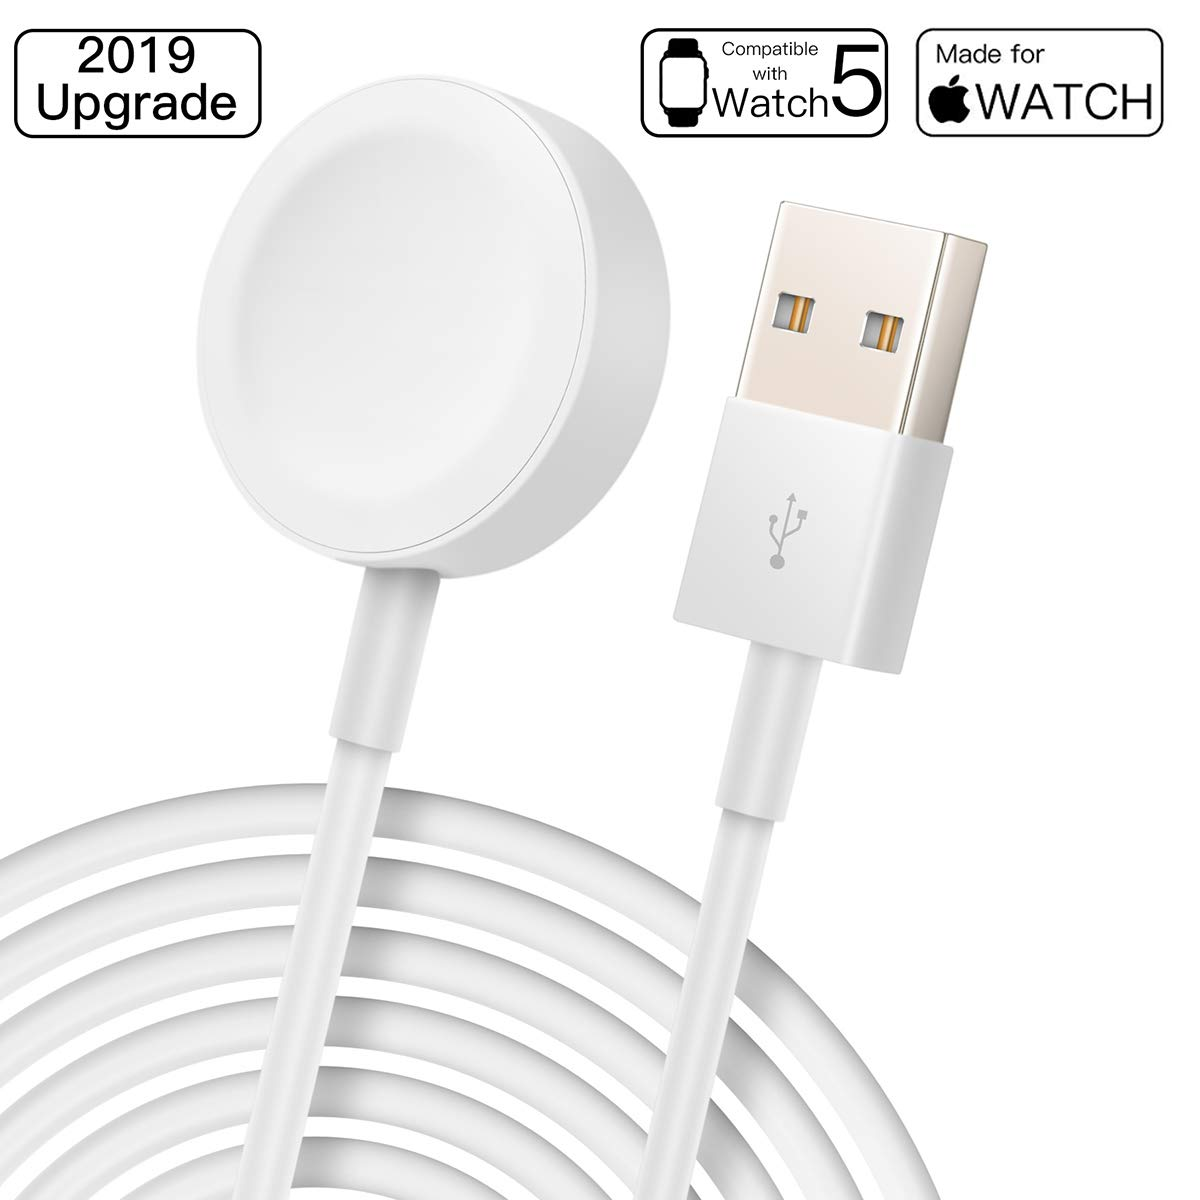 Charger para Appl e Watch,Cargador Magnética para iWatch Cargador Magnética para el Apple Watch Series 1/2/3/4,38mm,40mm,42mm,44mm(1M)